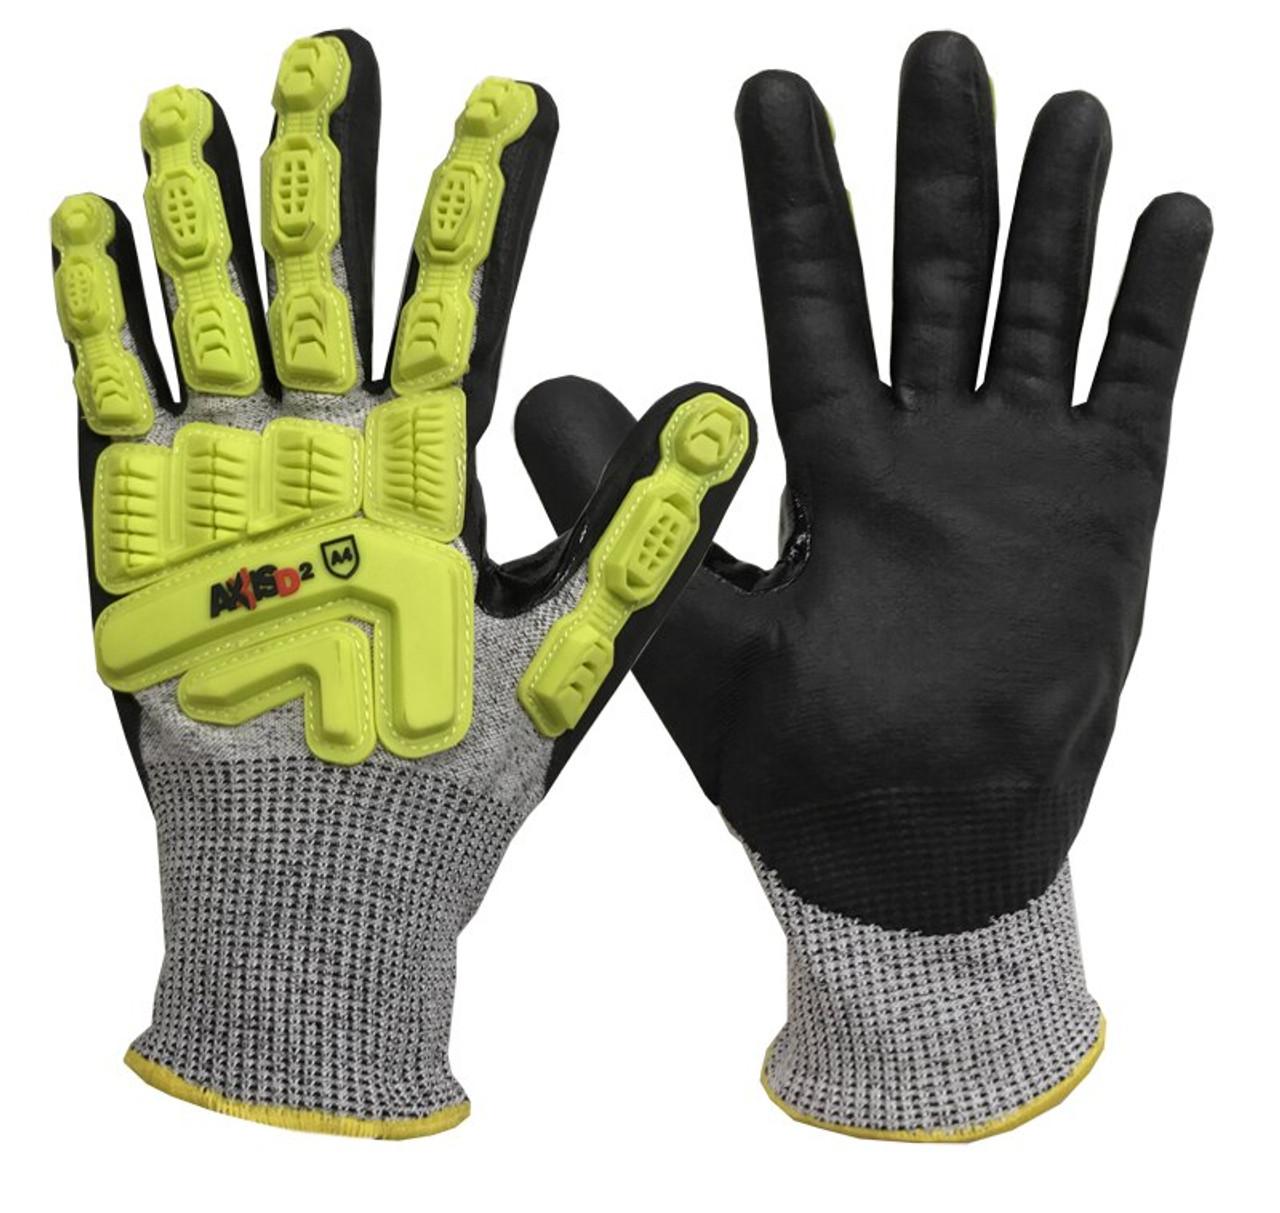 Radians ANSI A4 - Dyneema Micro Nitrile Palm Coated Cut / Impact Gloves